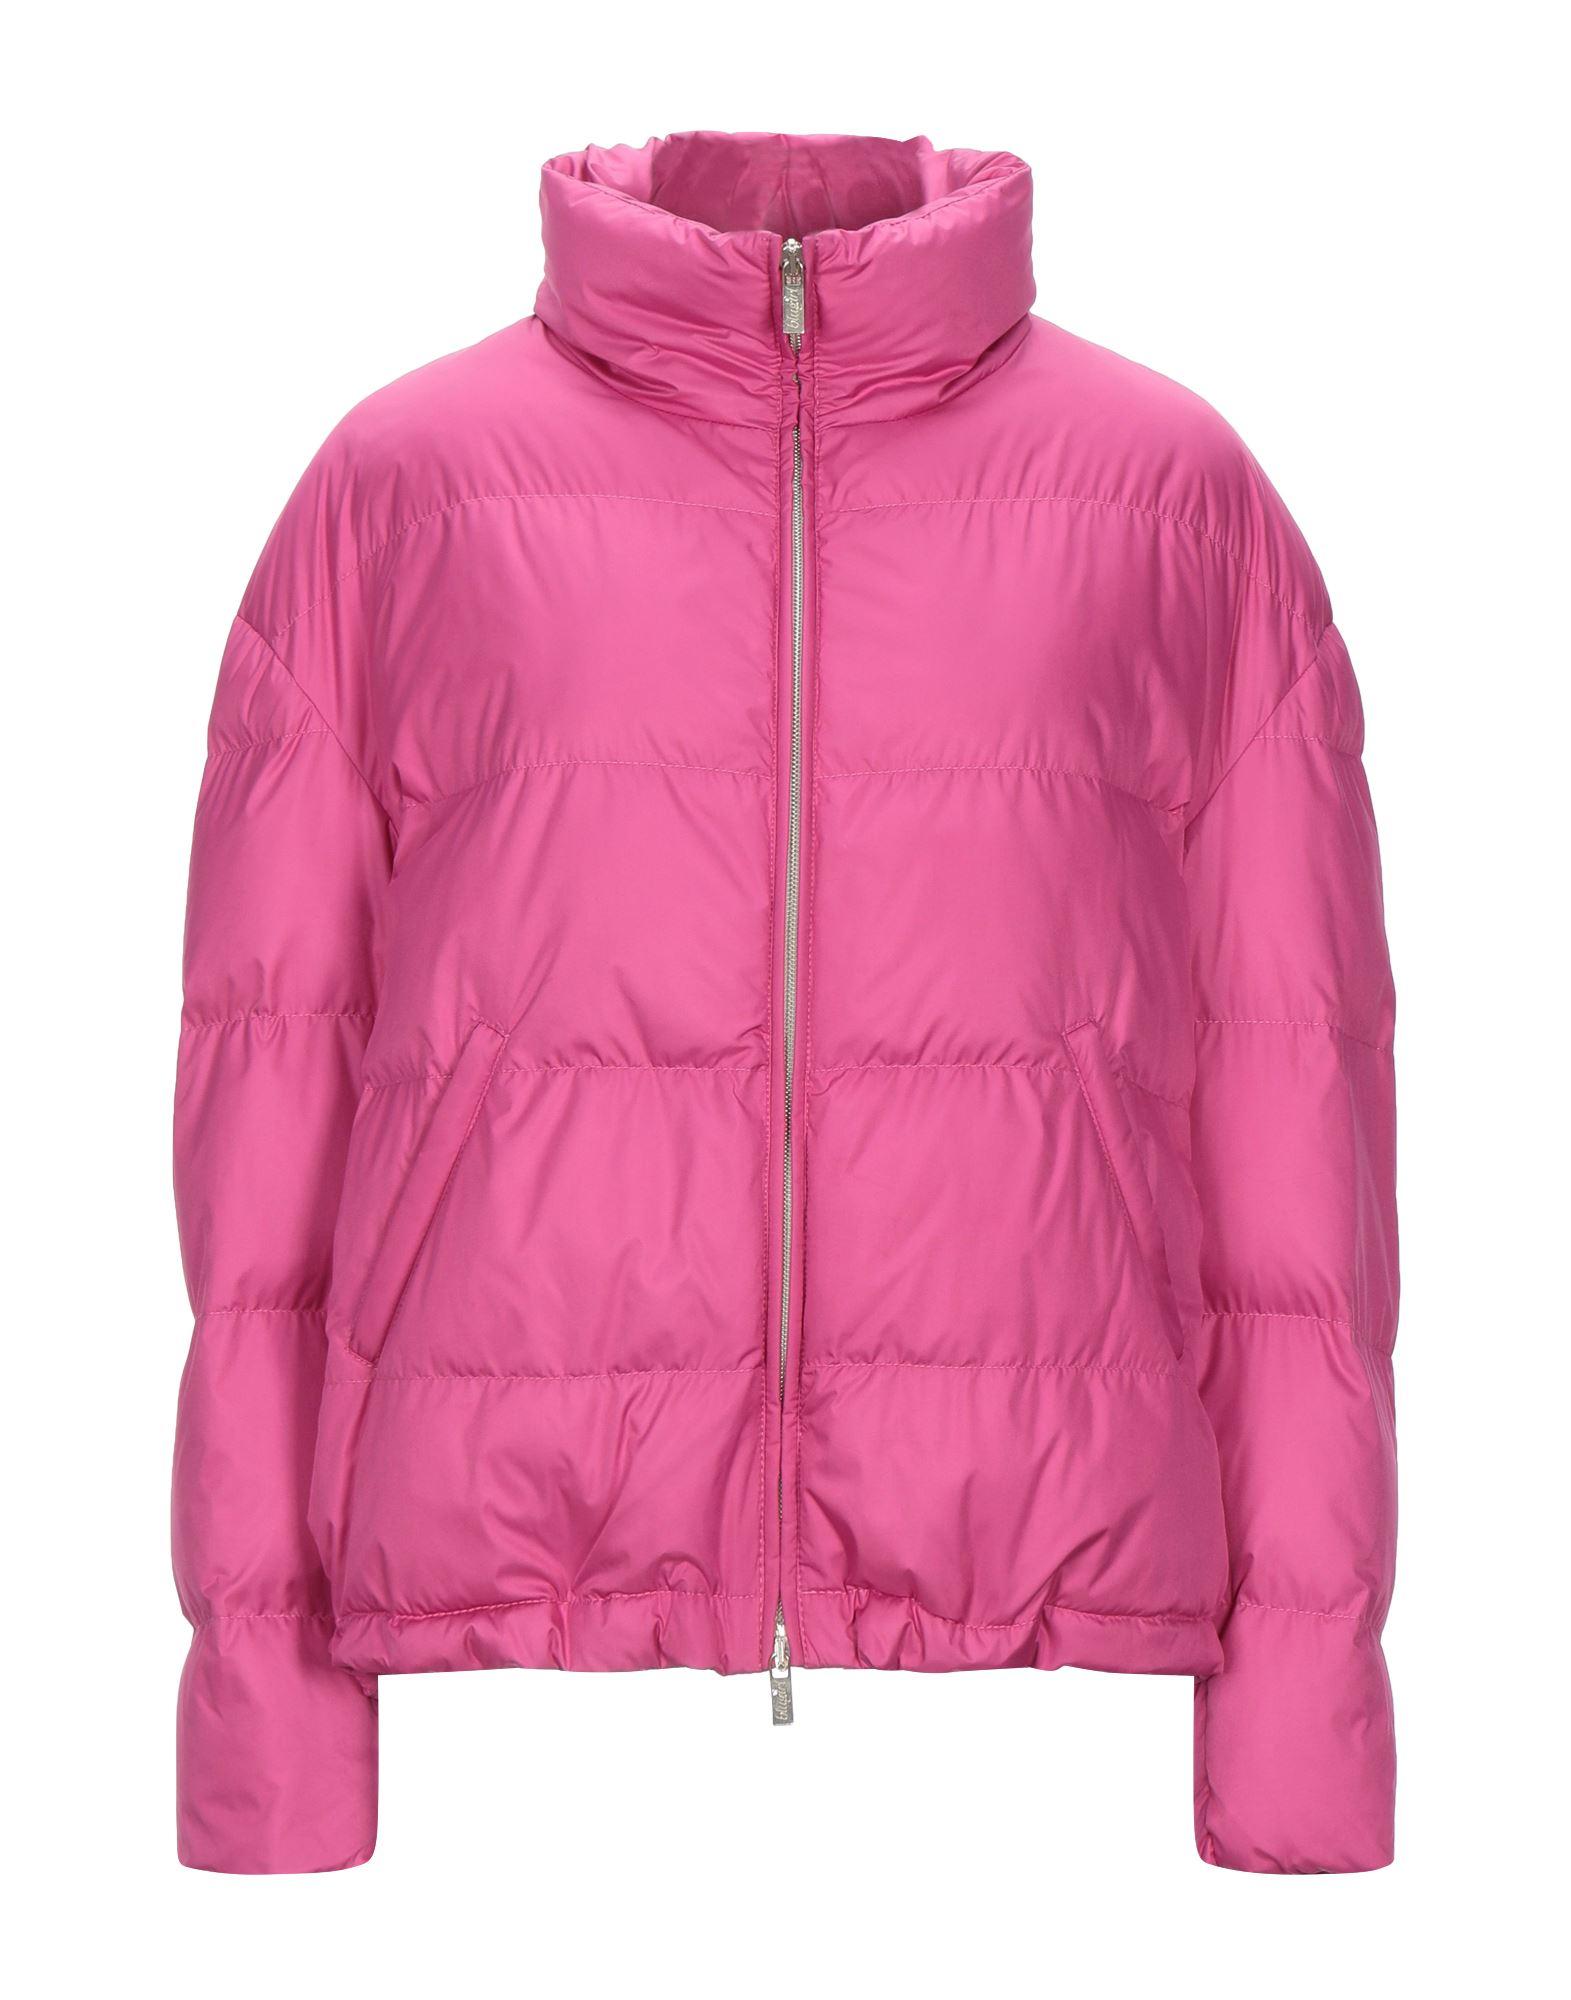 BLUGIRL BLUMARINE Synthetic Down Jackets - Item 16010178